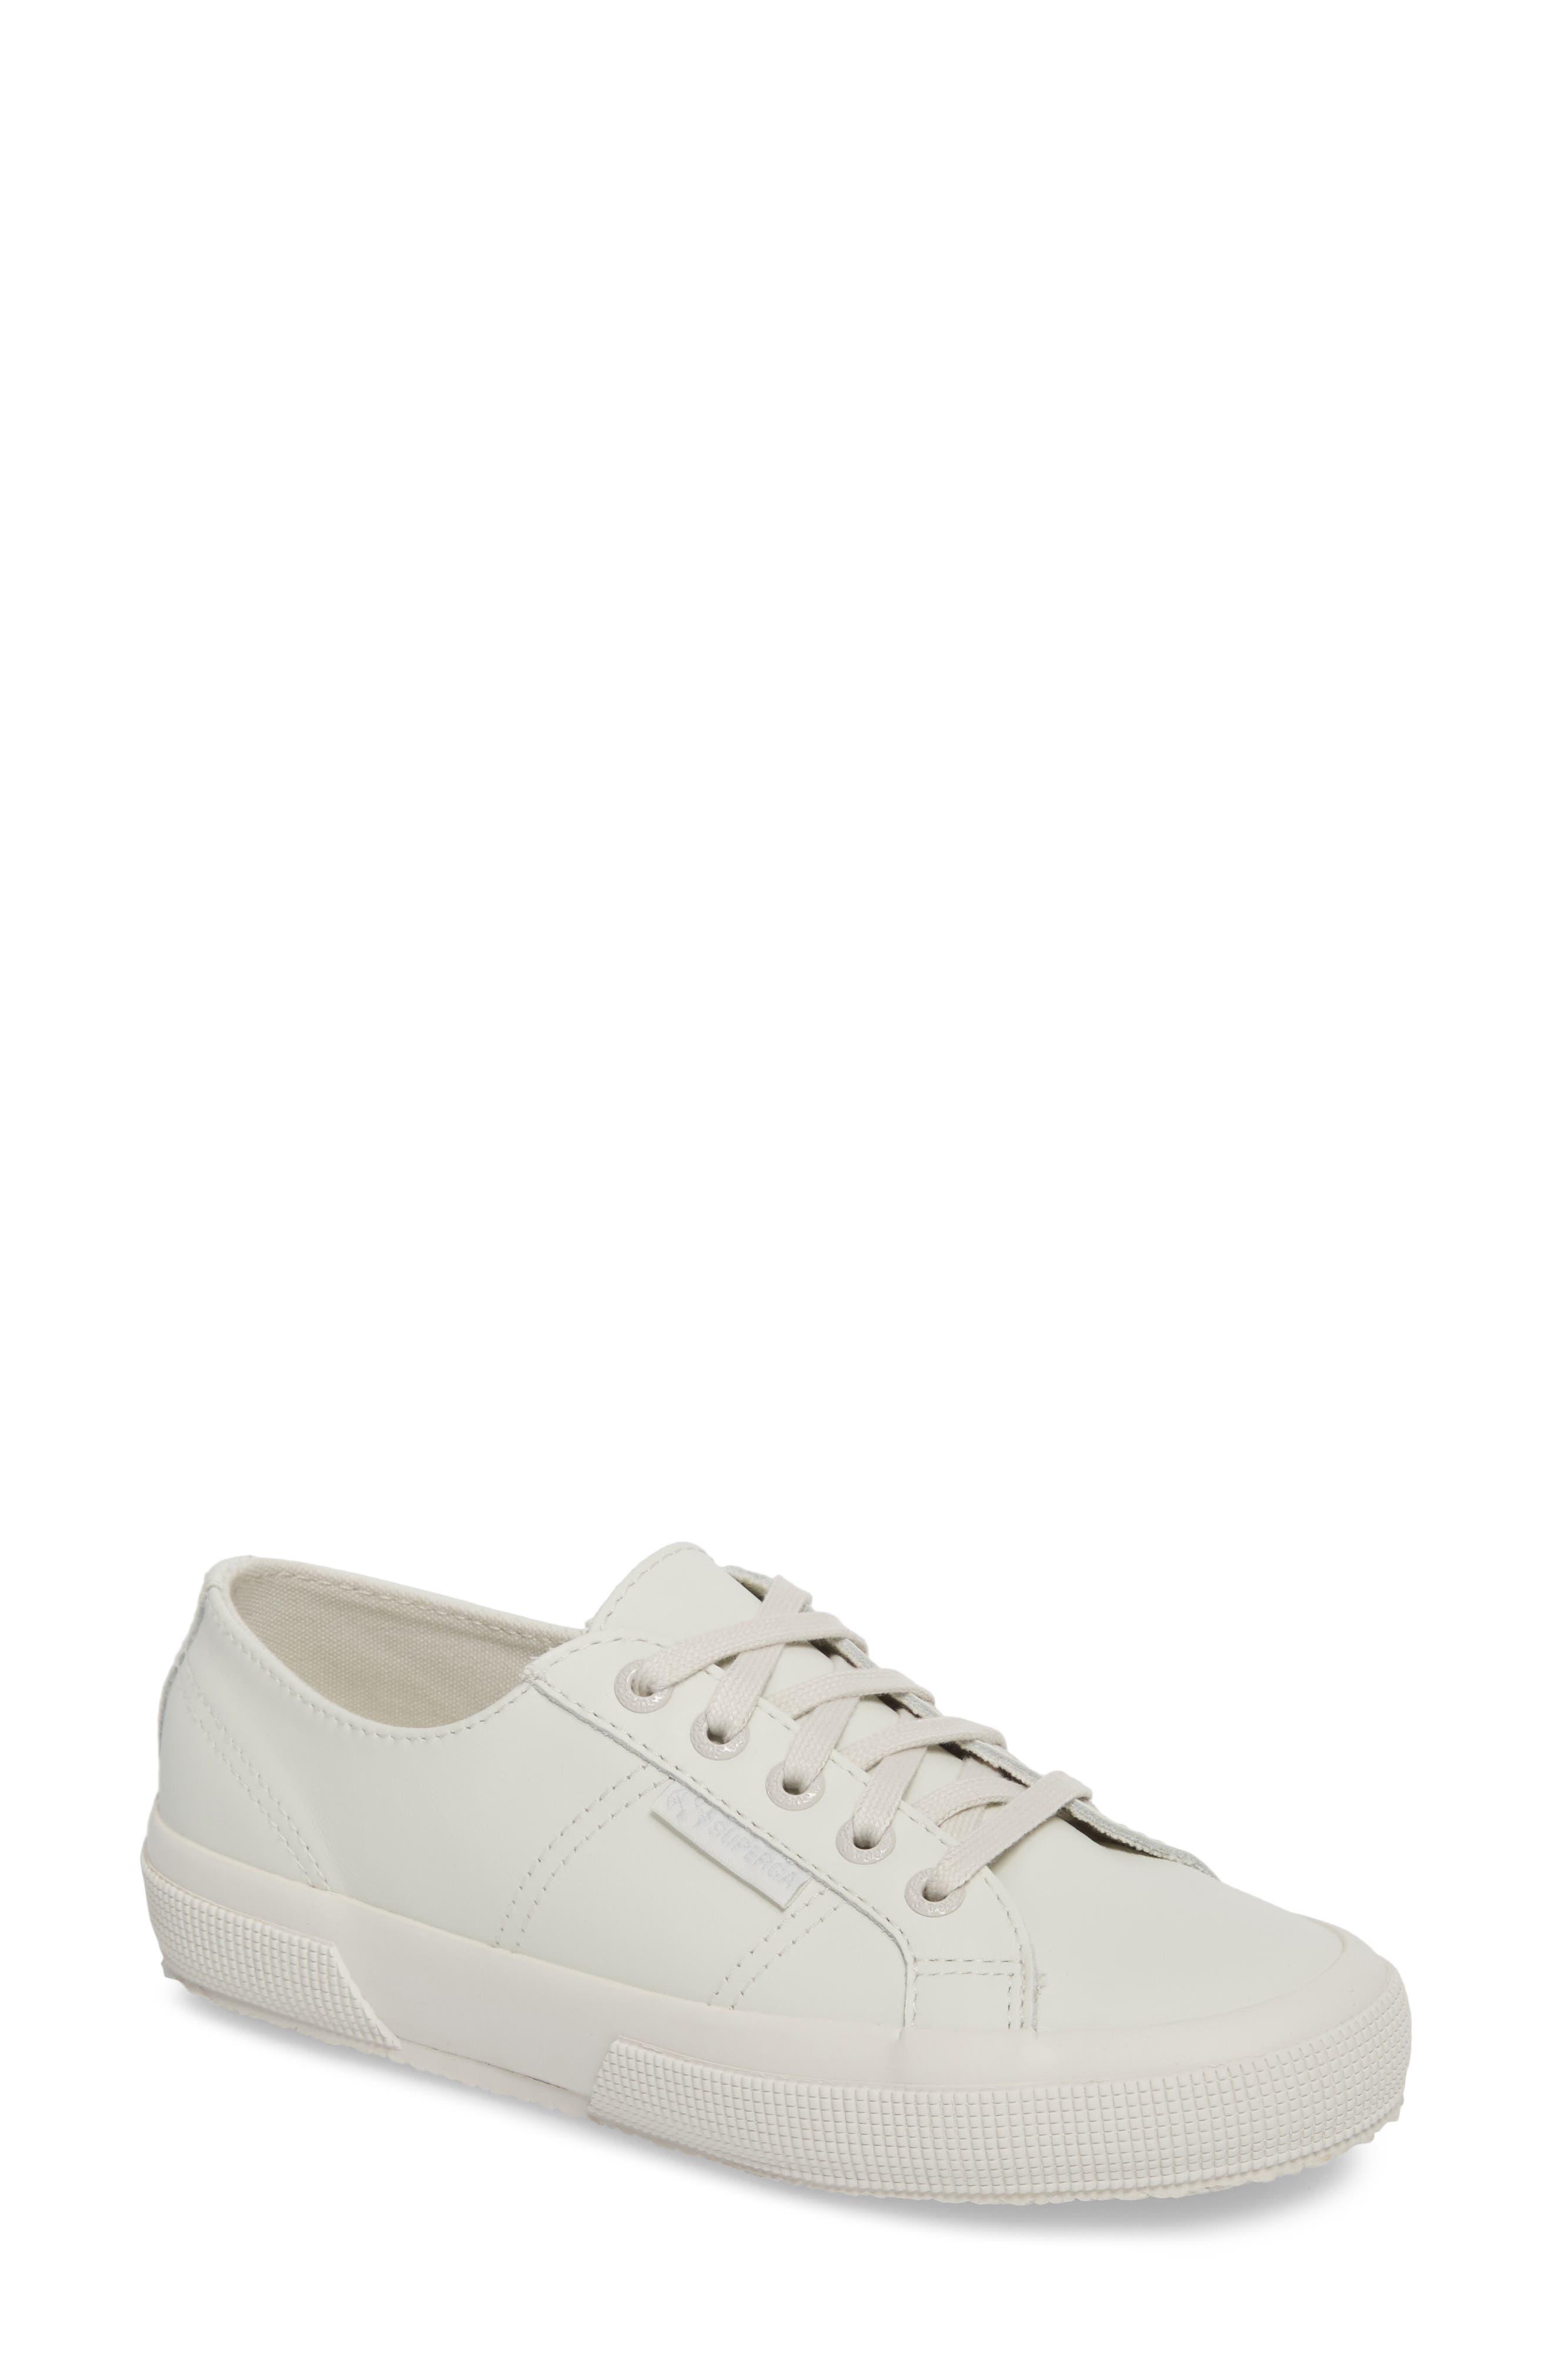 '2750' Sneaker,                             Main thumbnail 1, color,                             108